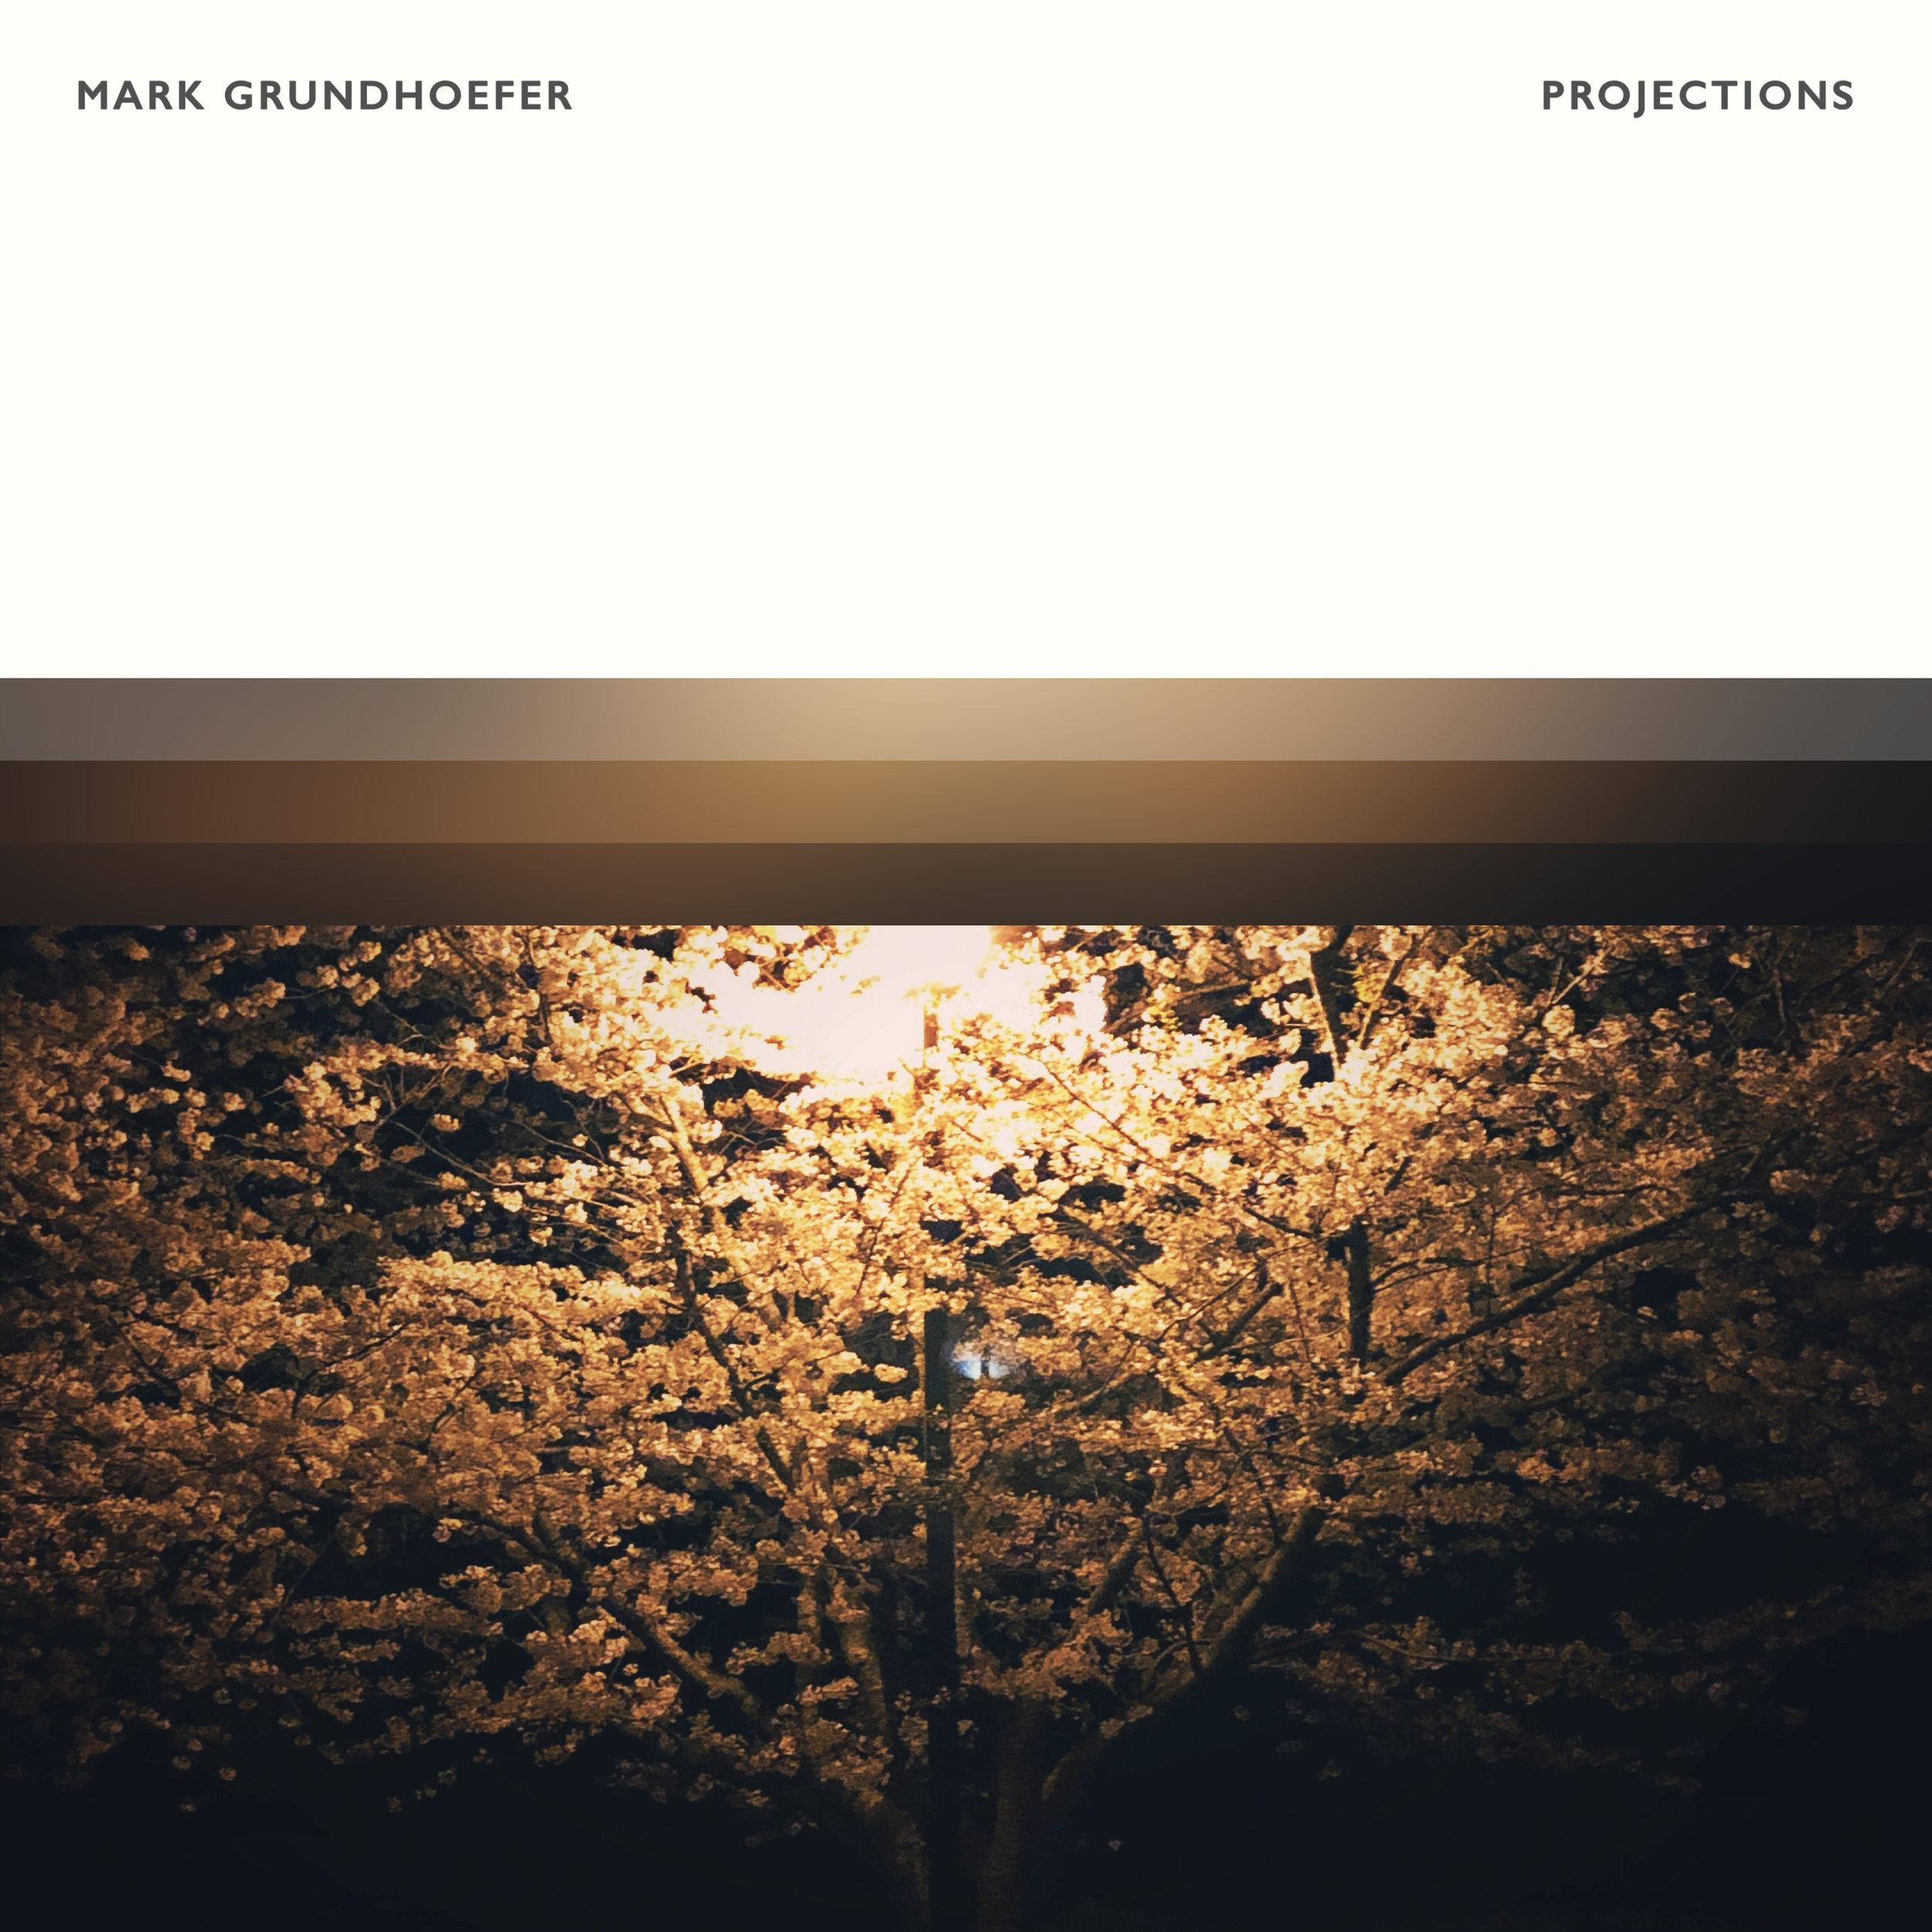 Mark Grundhoefer - Projections